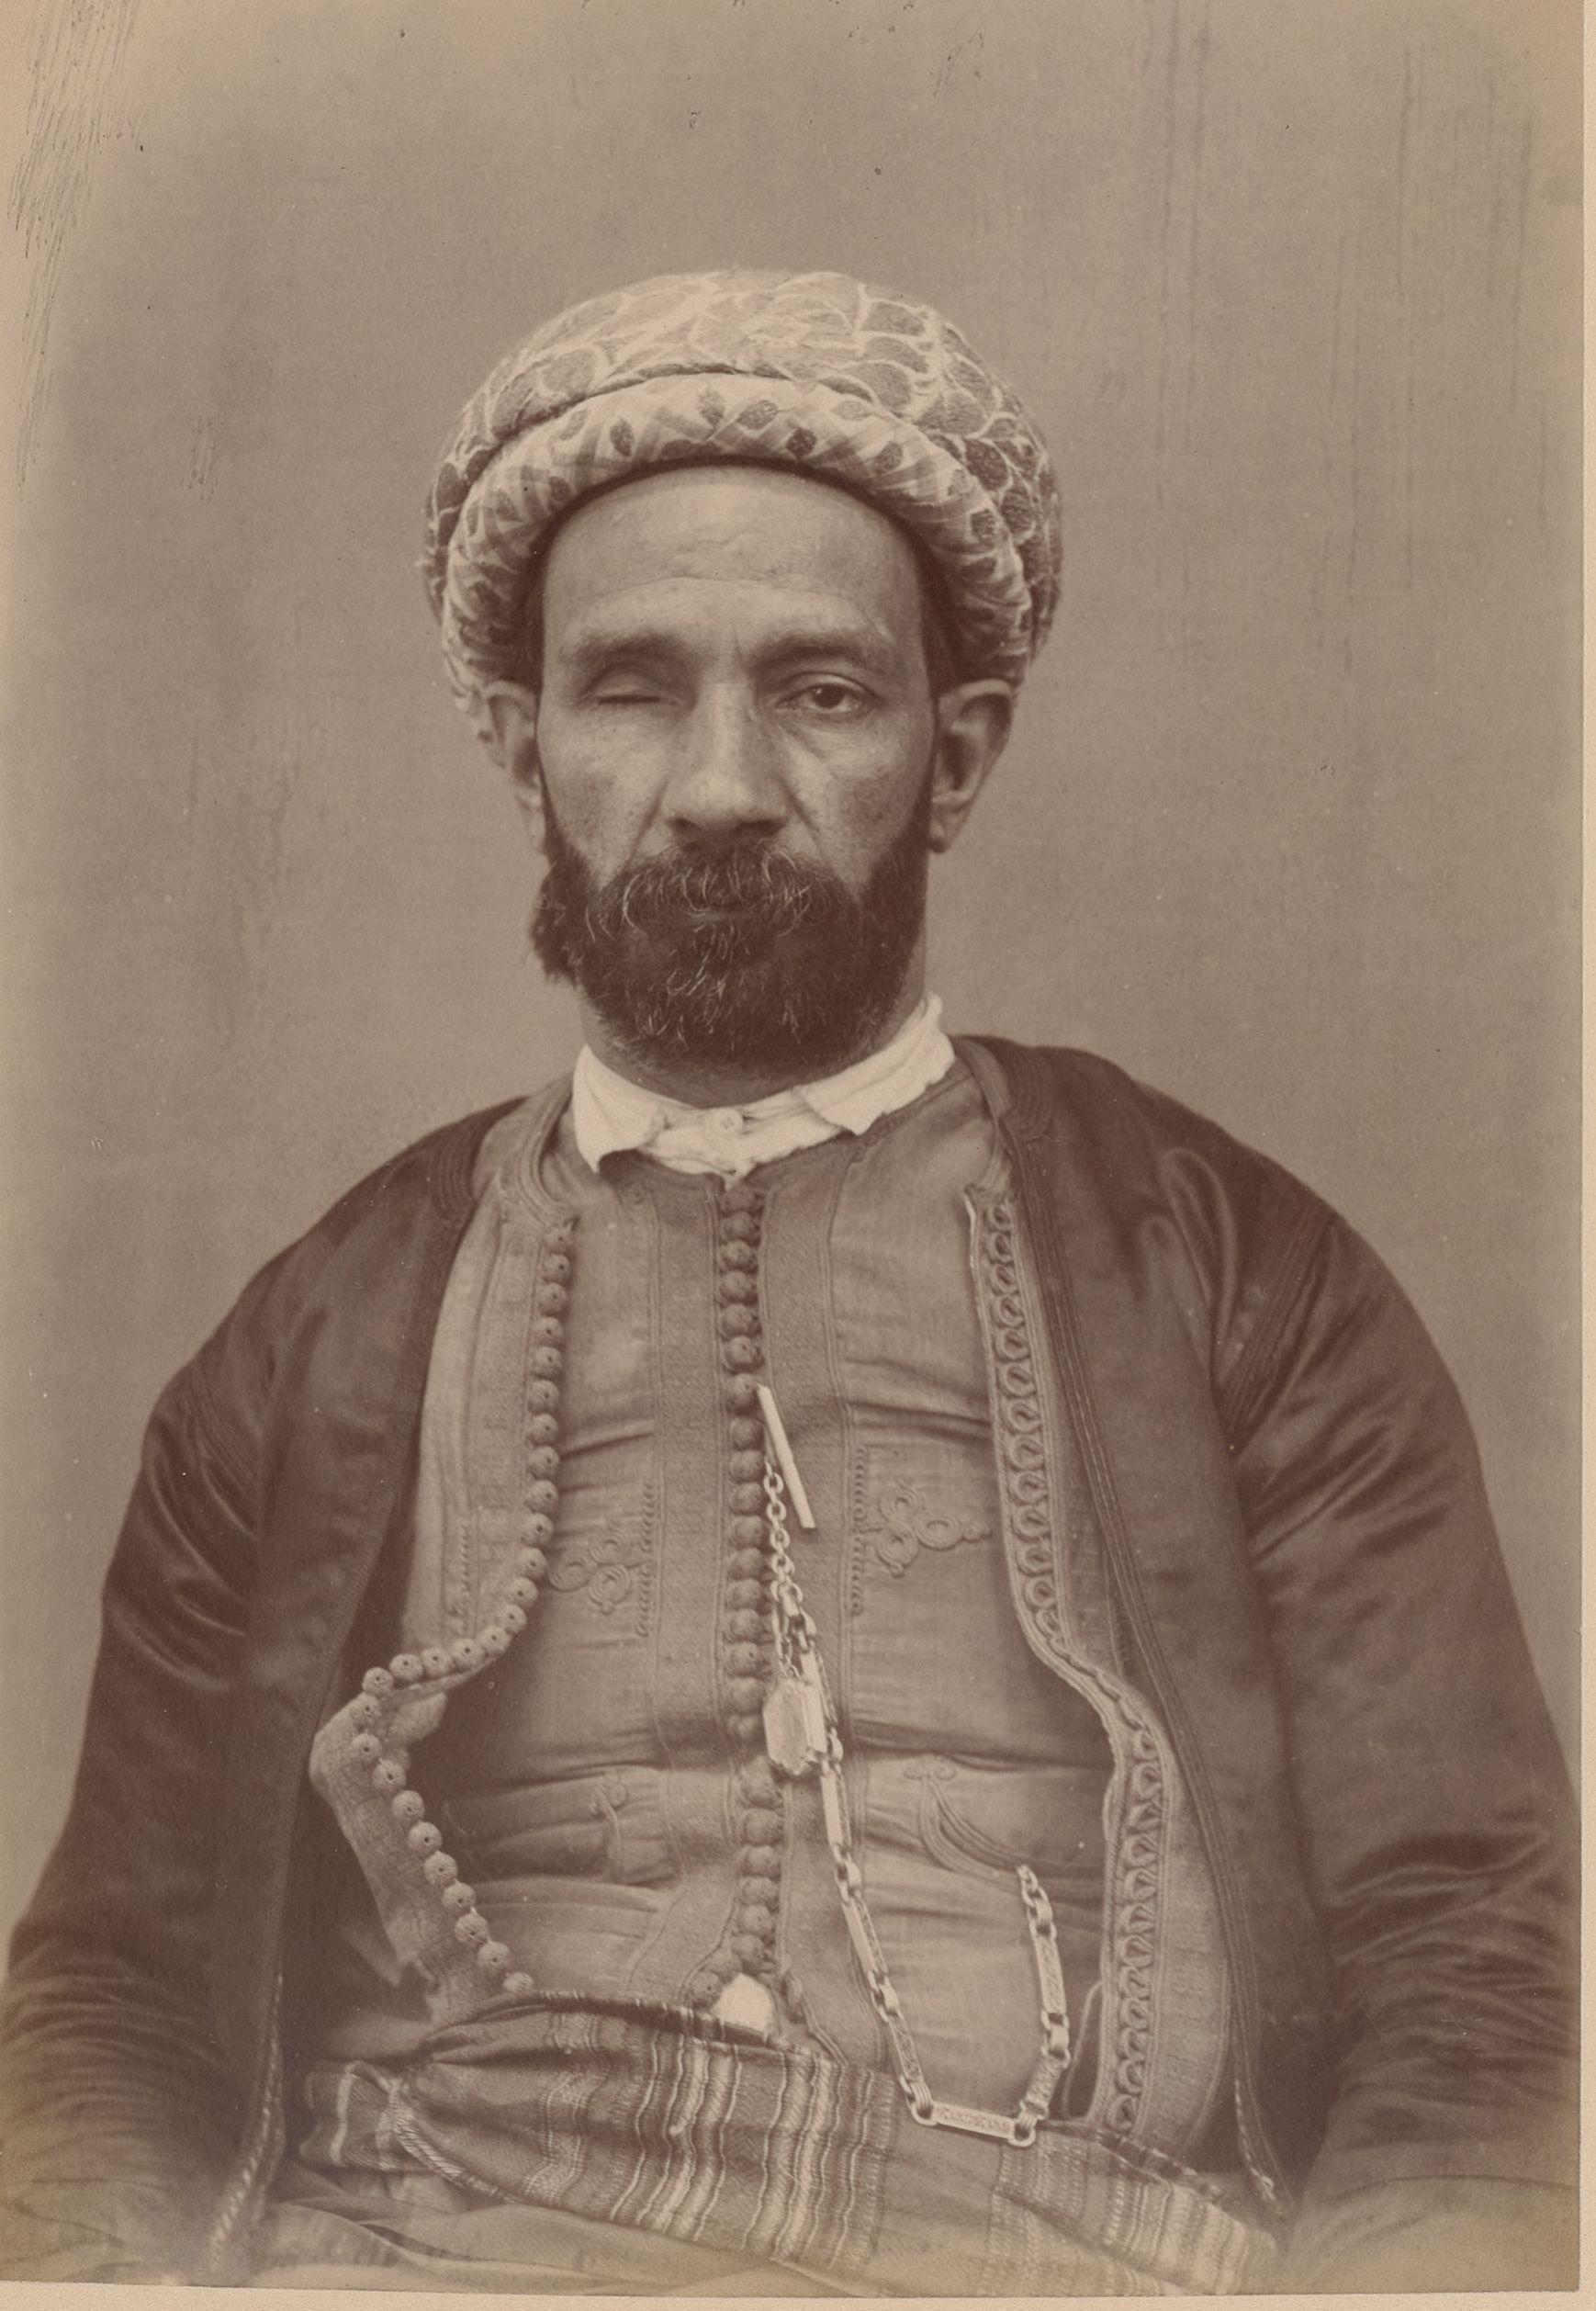 Аим Четрите. 45 лет, Алжир, плотник (вид спереди)